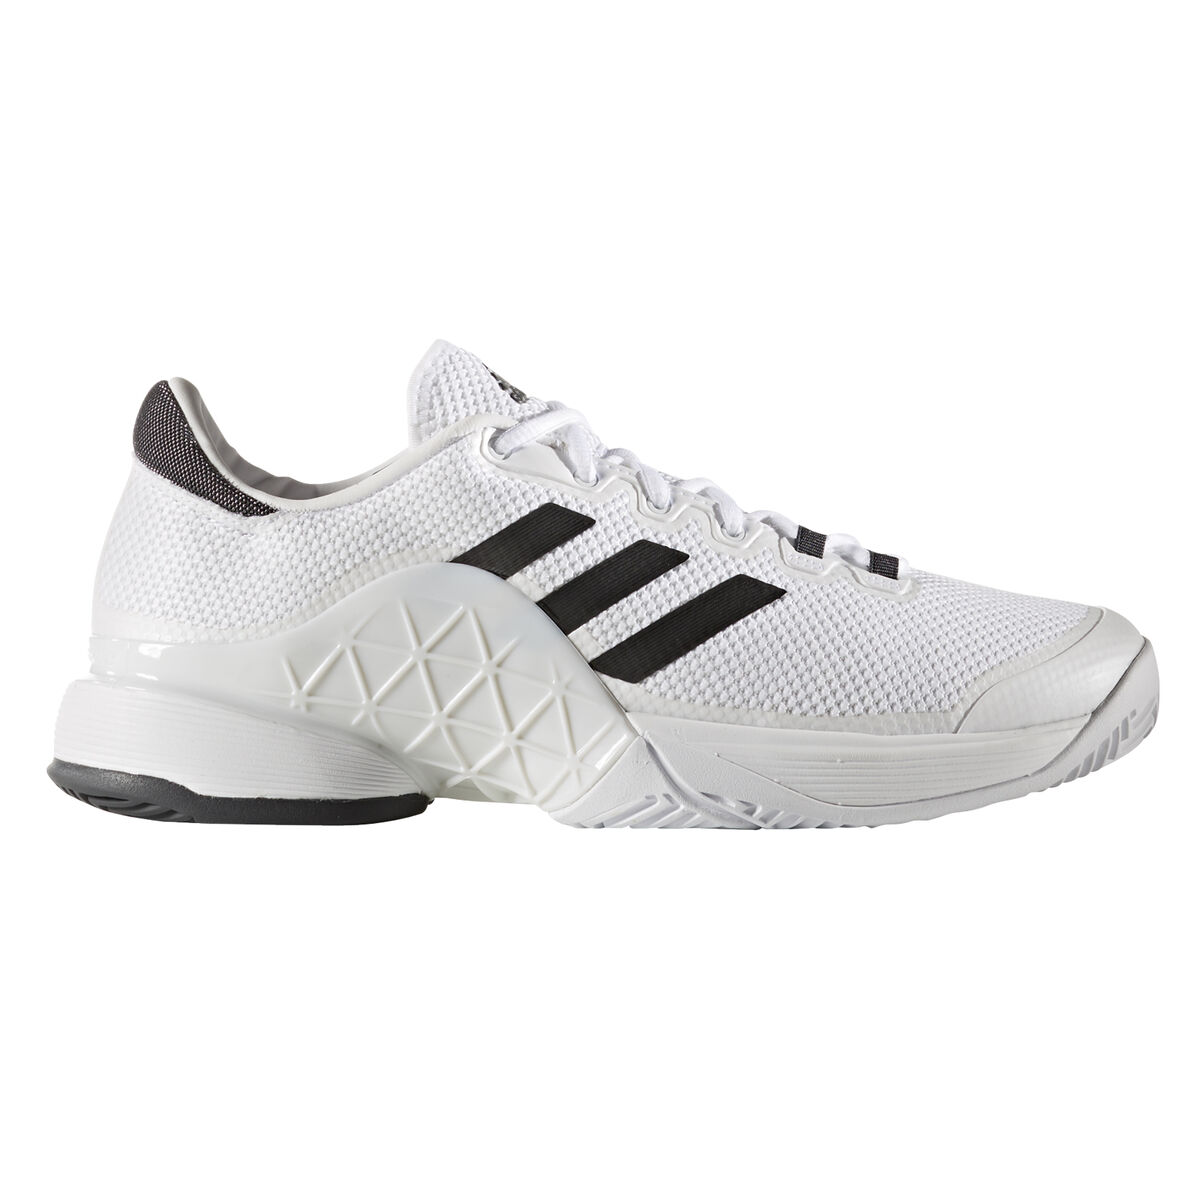 d4320c47f Images. adidas Barricade 2017 Men  39 s Tennis Shoe - White Black